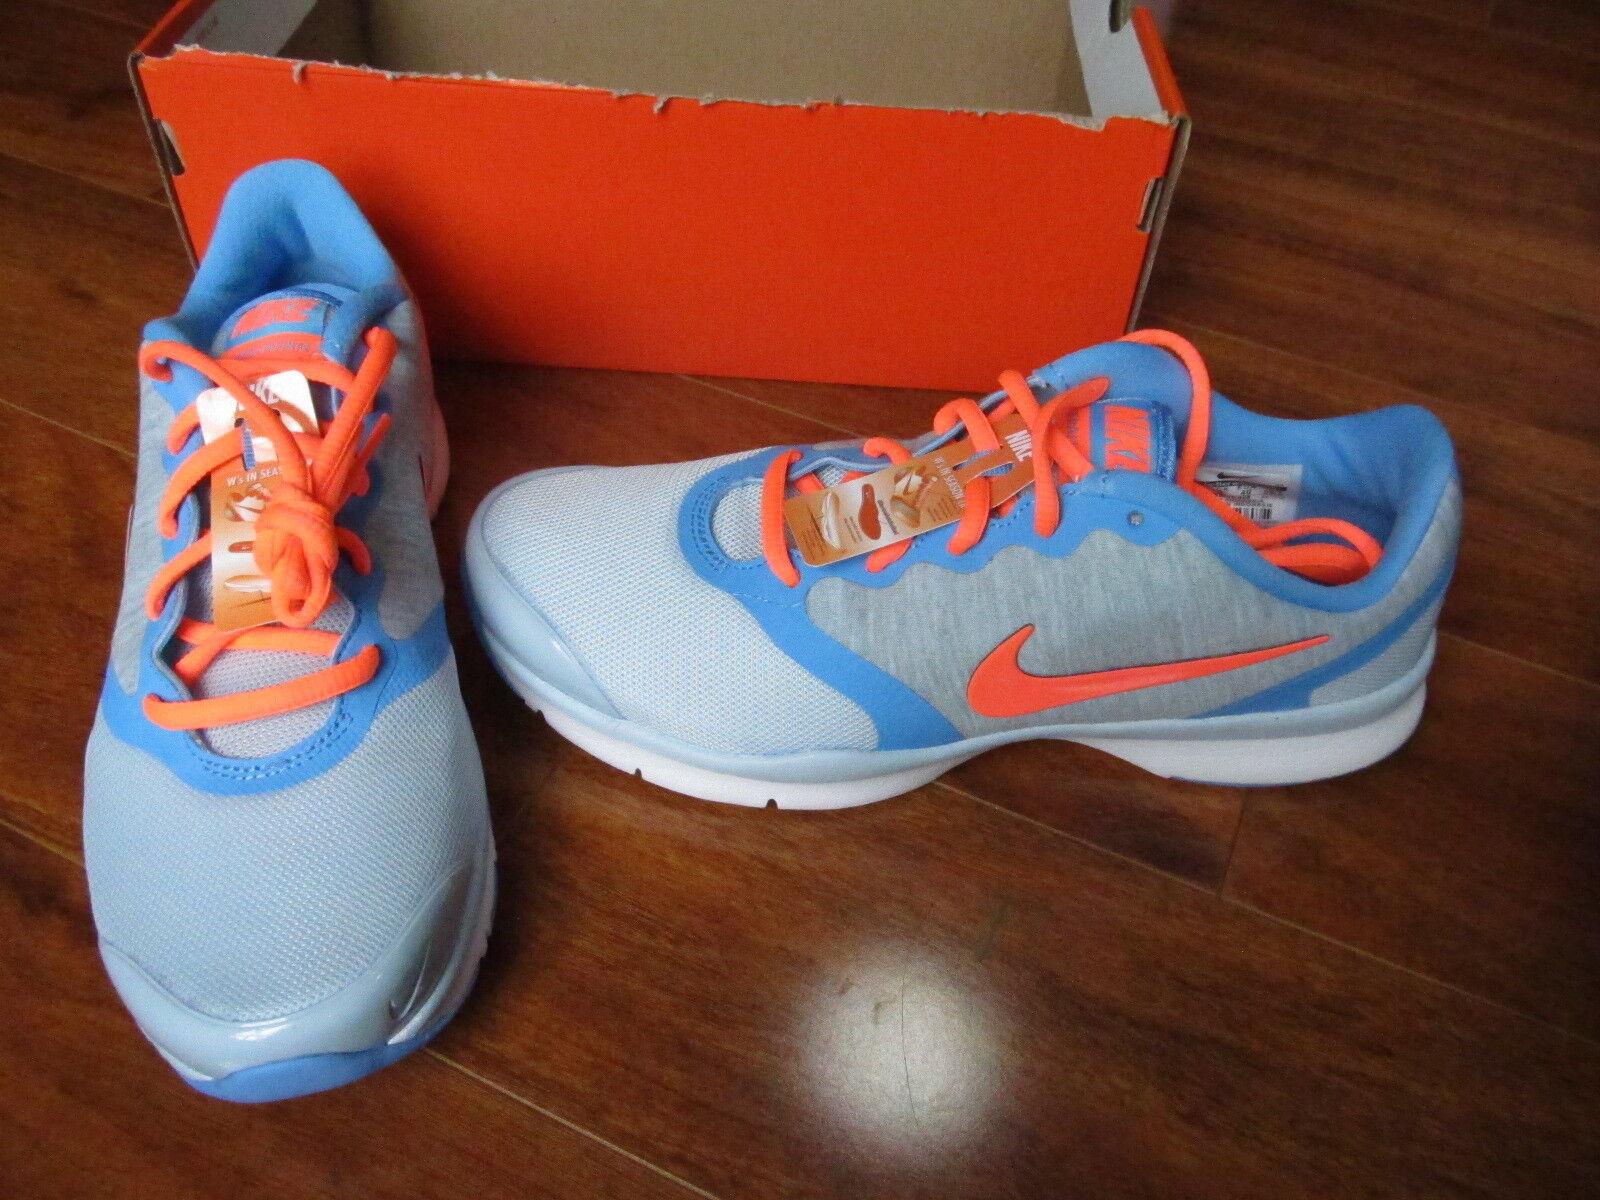 NEW Training NIKE In-Season Tr 4 Training NEW Shoes WOMENS SZ 6 Grey/Mango/Blue 00 c3e390